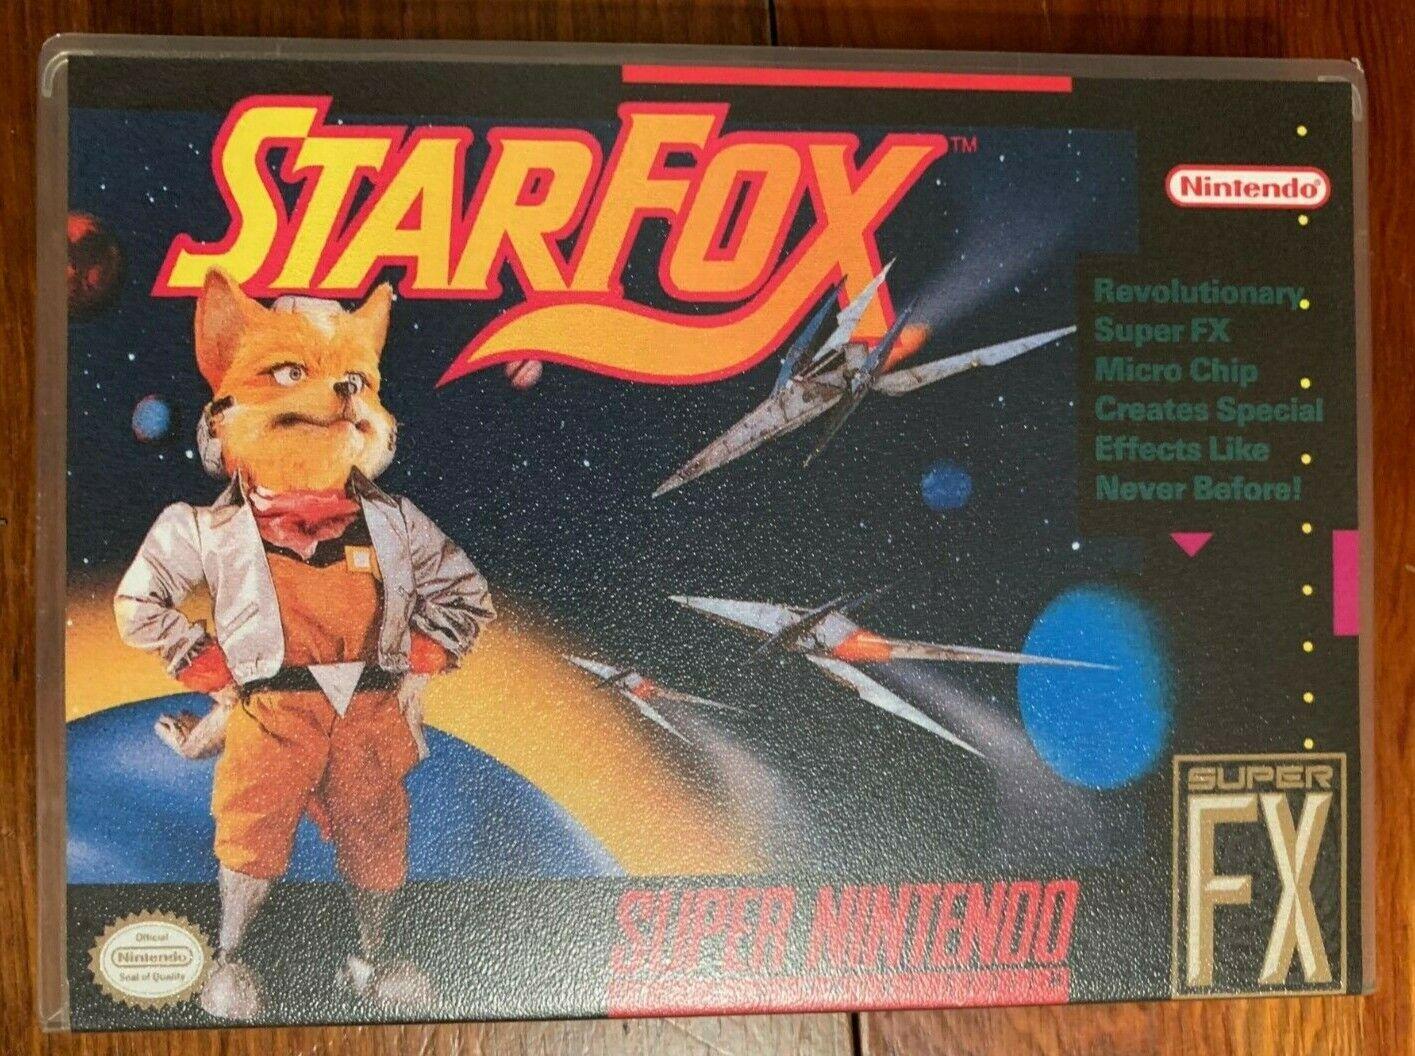 SNES Star Fox Custom Case Super Nintendo 1993 Clean Authentic Good Condition - $18.99